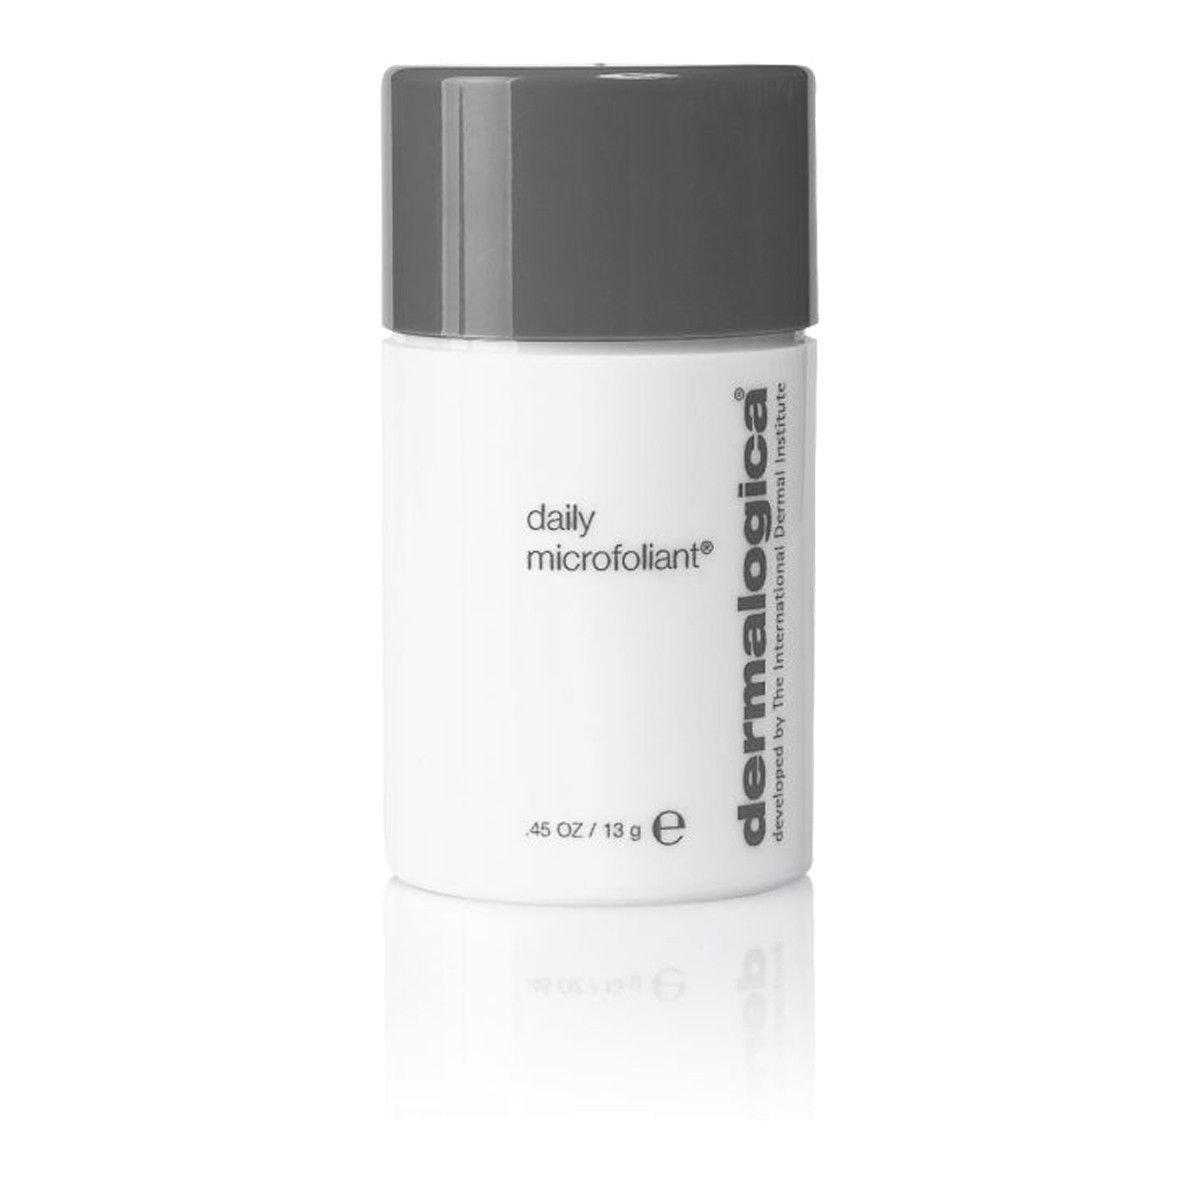 Afbeelding van Dermalogica Daily Microfoliant 13Gr Skin Health Alle huidcondities Beauty